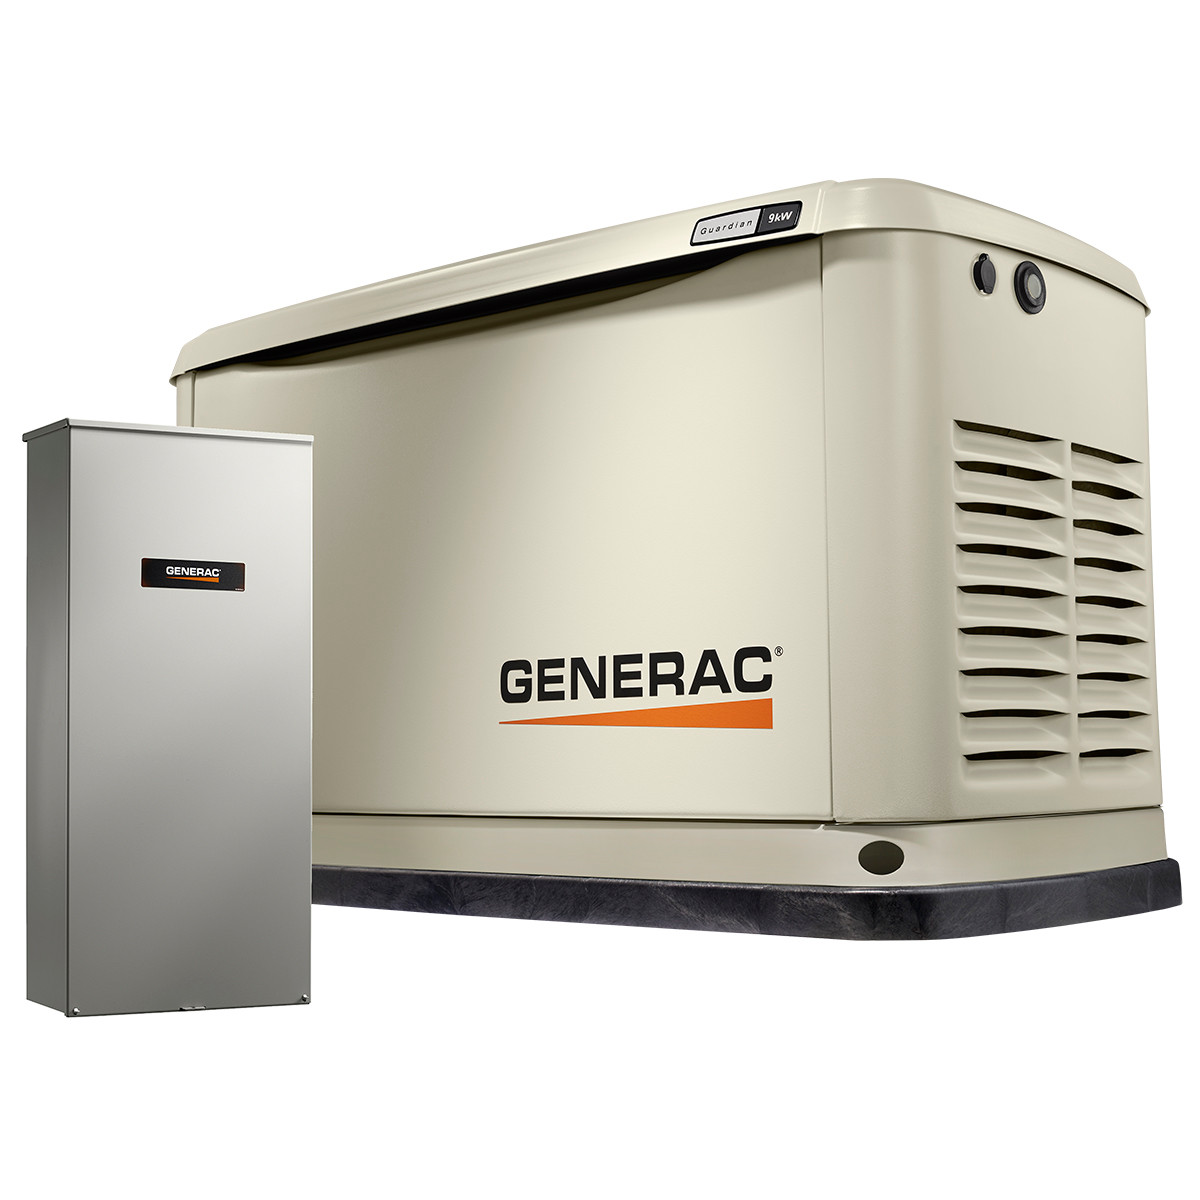 medium resolution of generac 7030 9kw generator 100a 16 circuit transfer switch 200 amp panel wiring diagram wiring diagram for generac 22kw free download